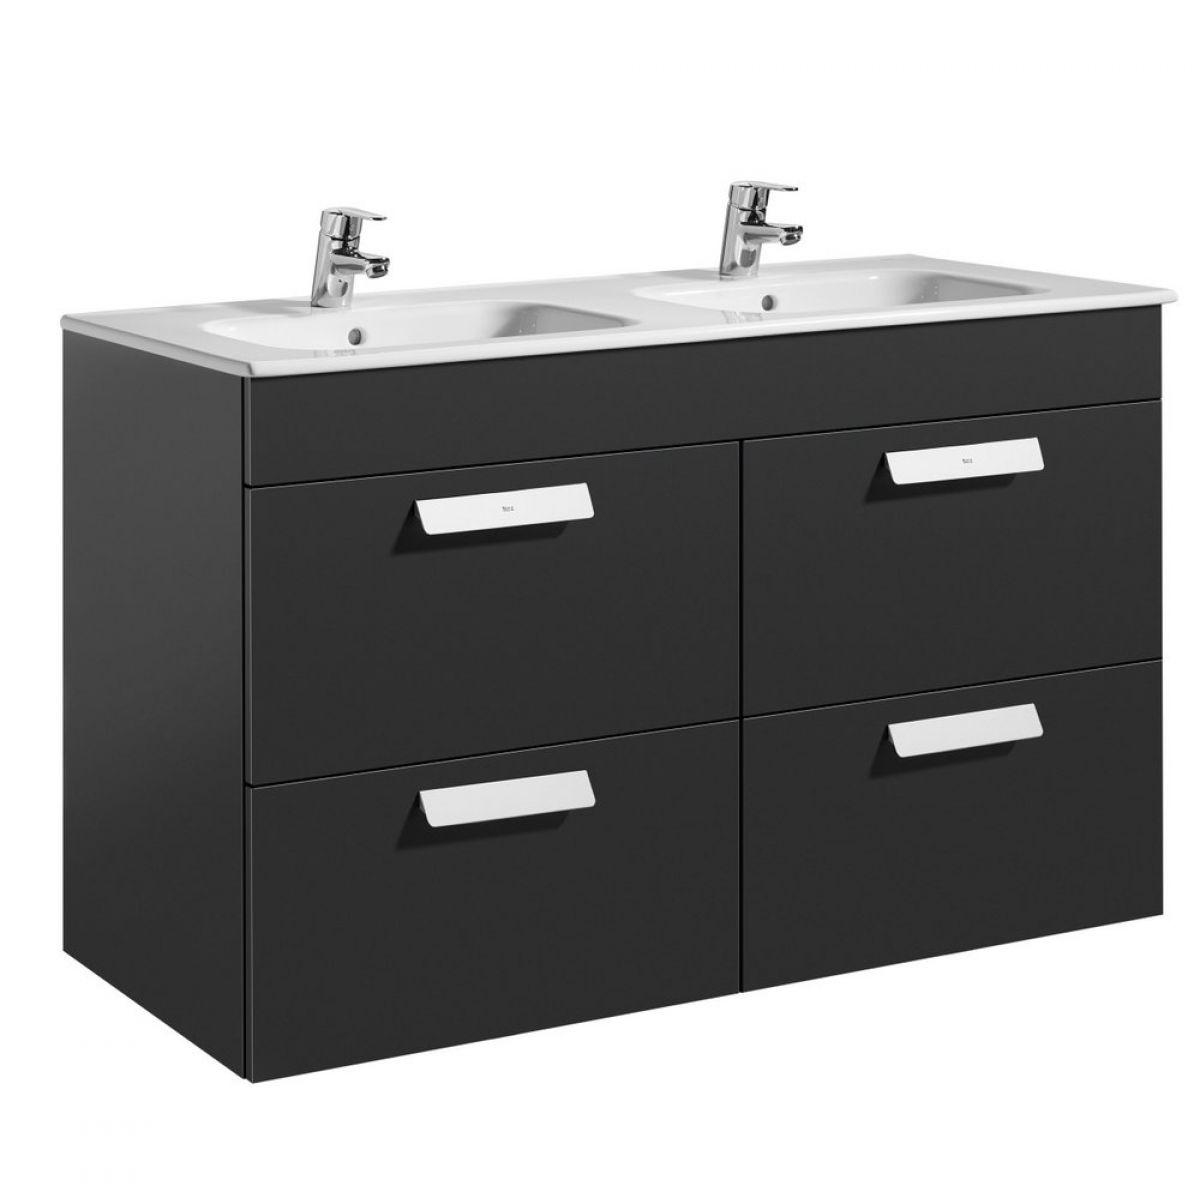 Roca Debba Double Basin Vanity Unit With Drawers Uk